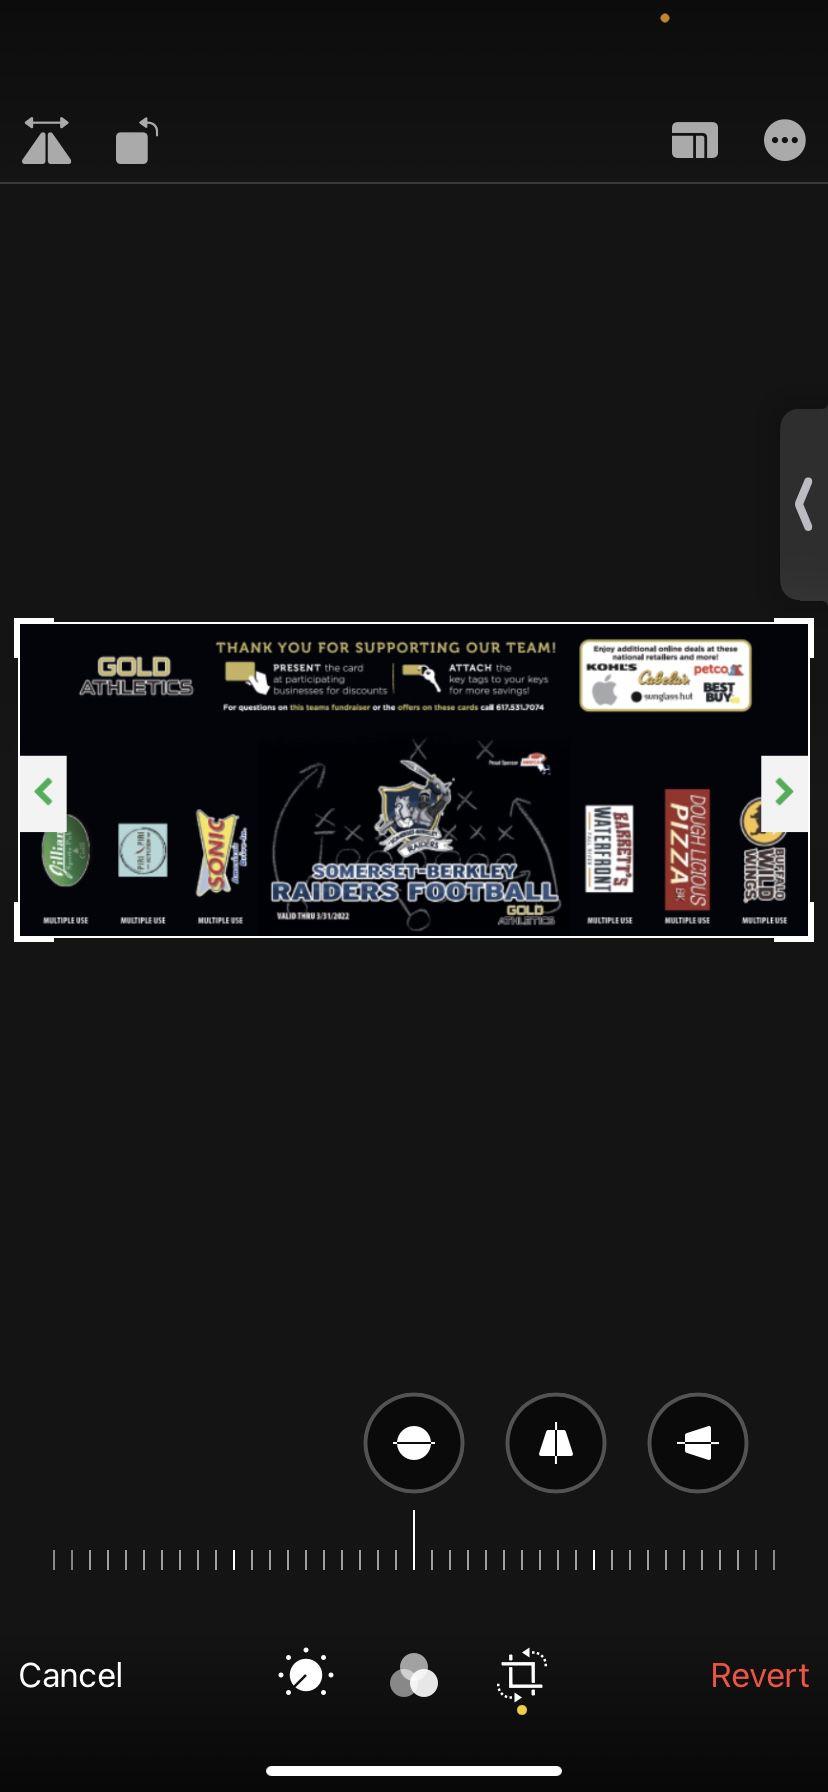 Discount Card For Somerset Berkley Football